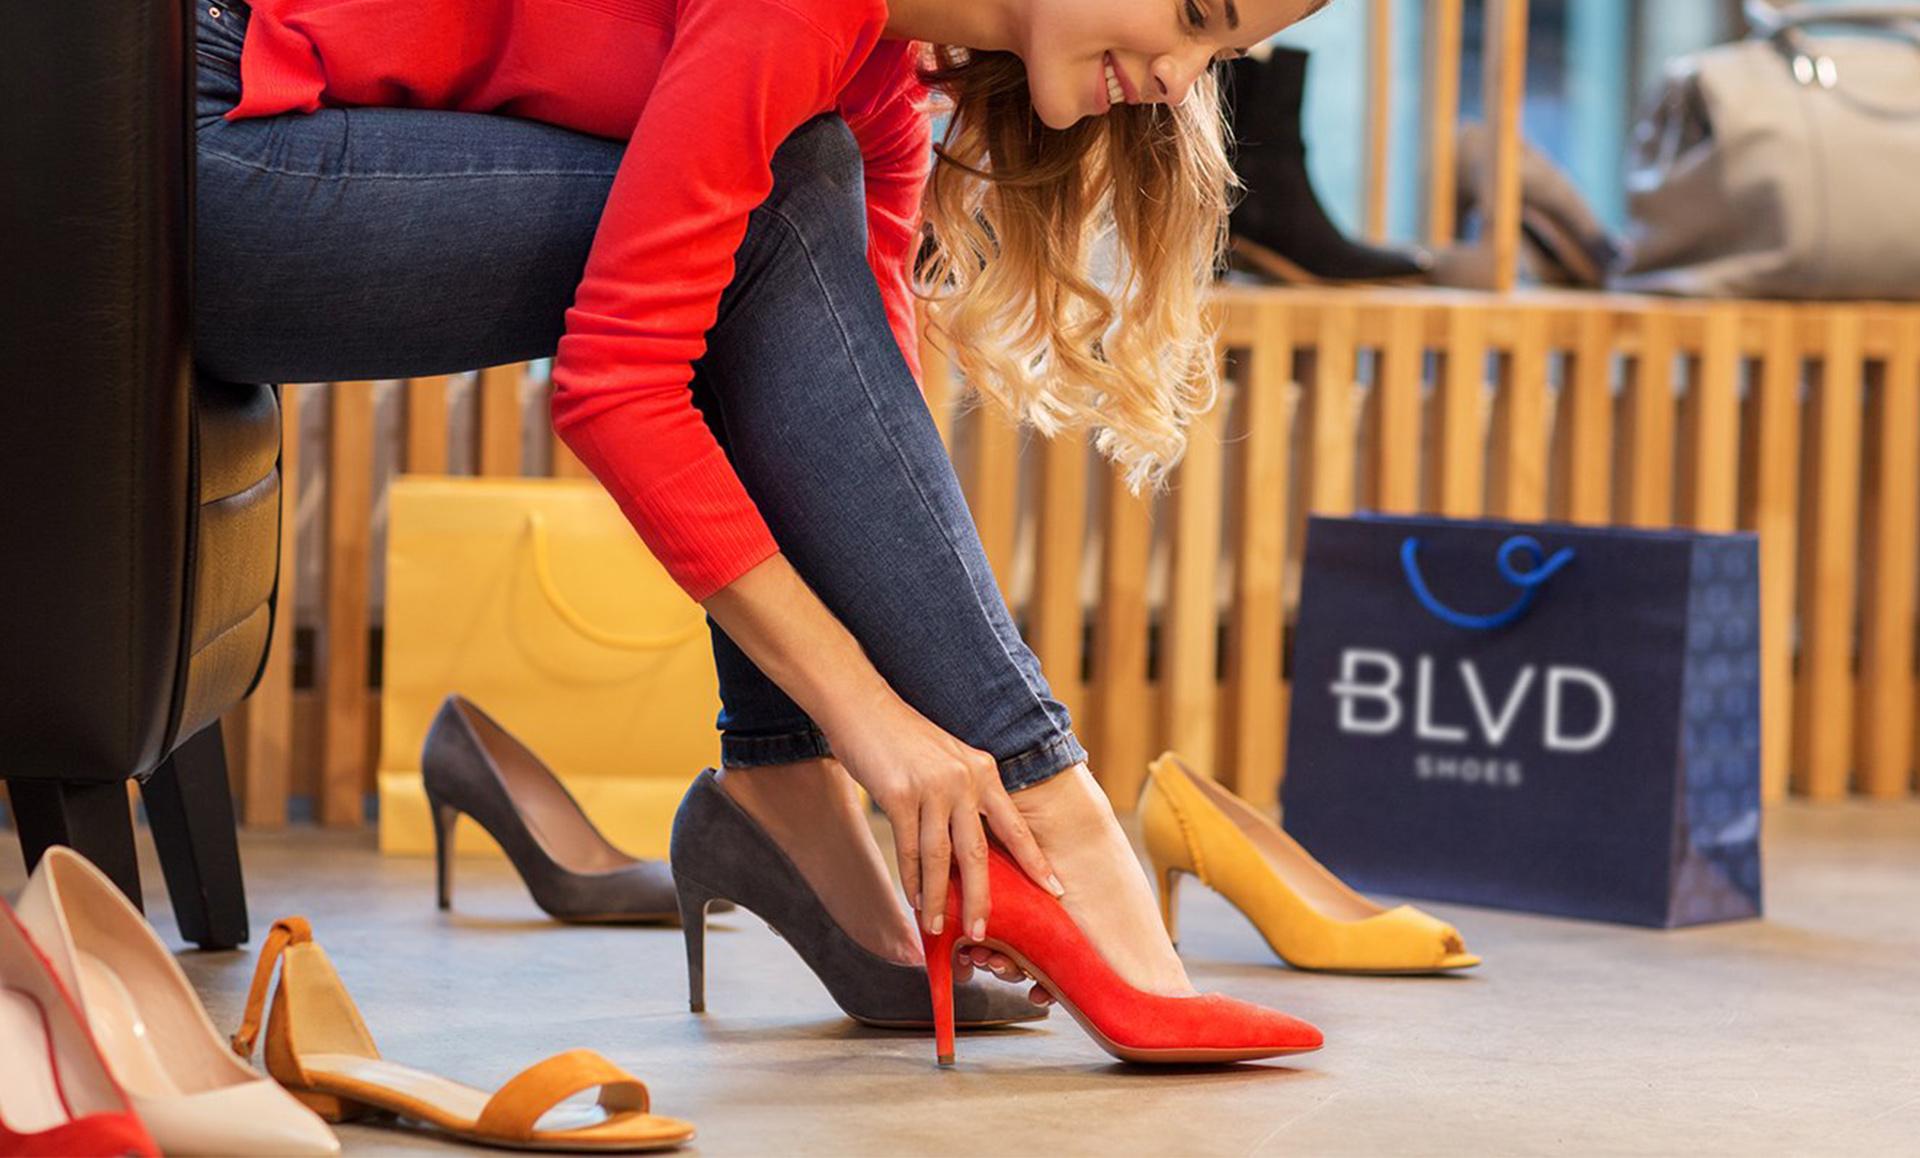 shoe store marketing women trying on shoes